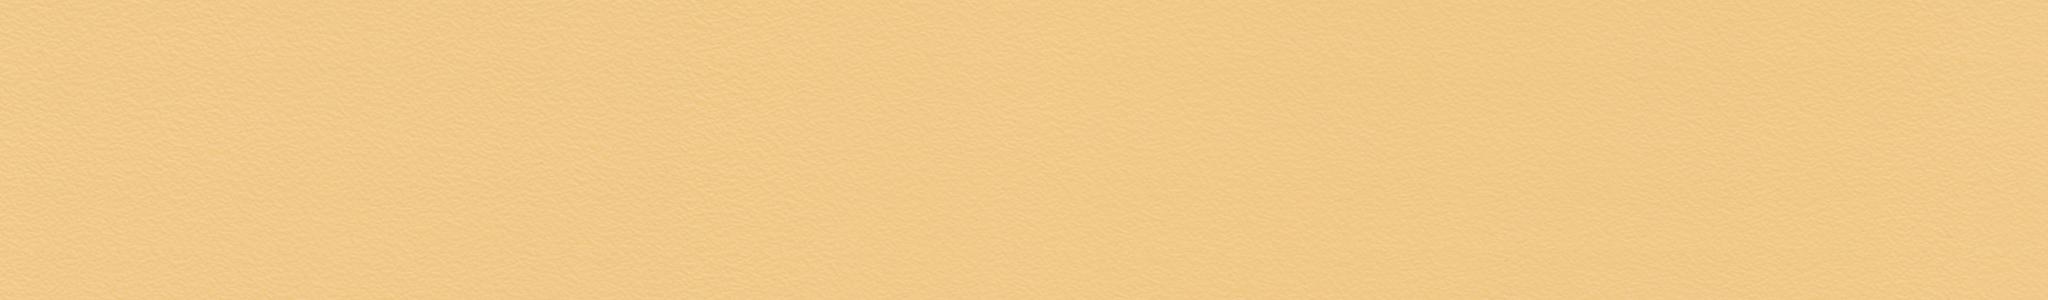 HU 115246 Кромка ABS Желтый Манго - Шагрень XG